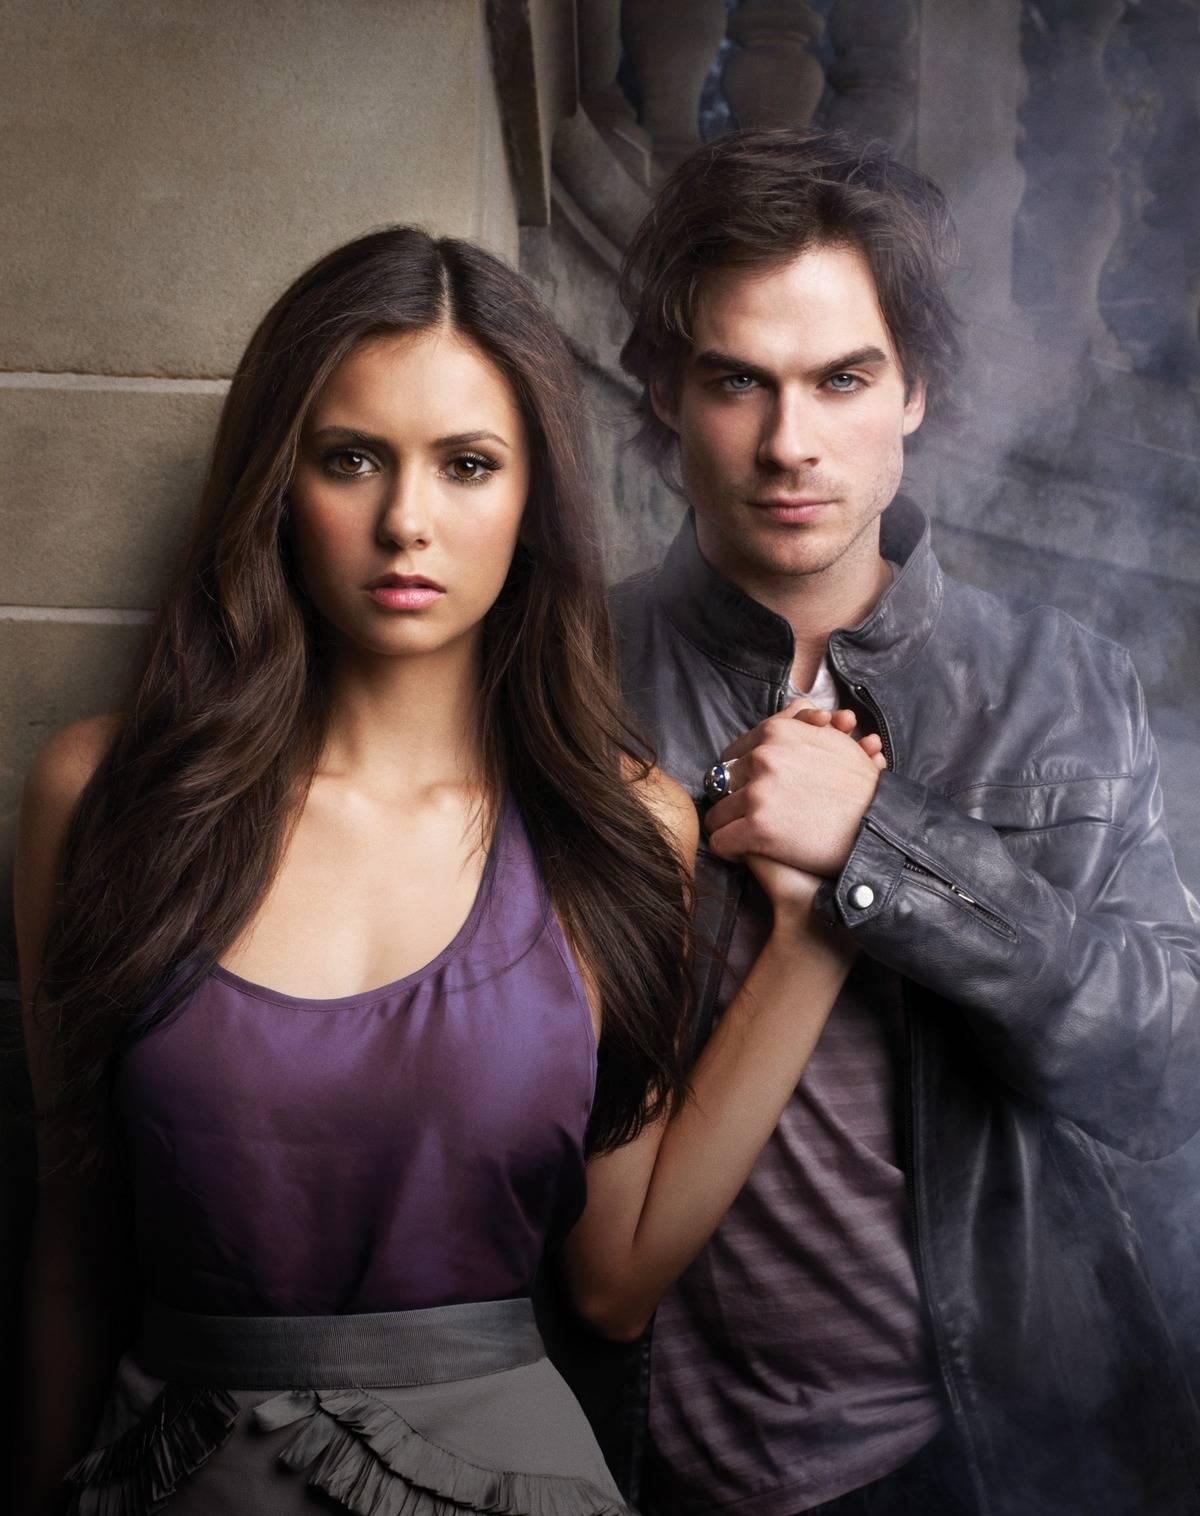 Elena and Damon from The Vampire Diaries